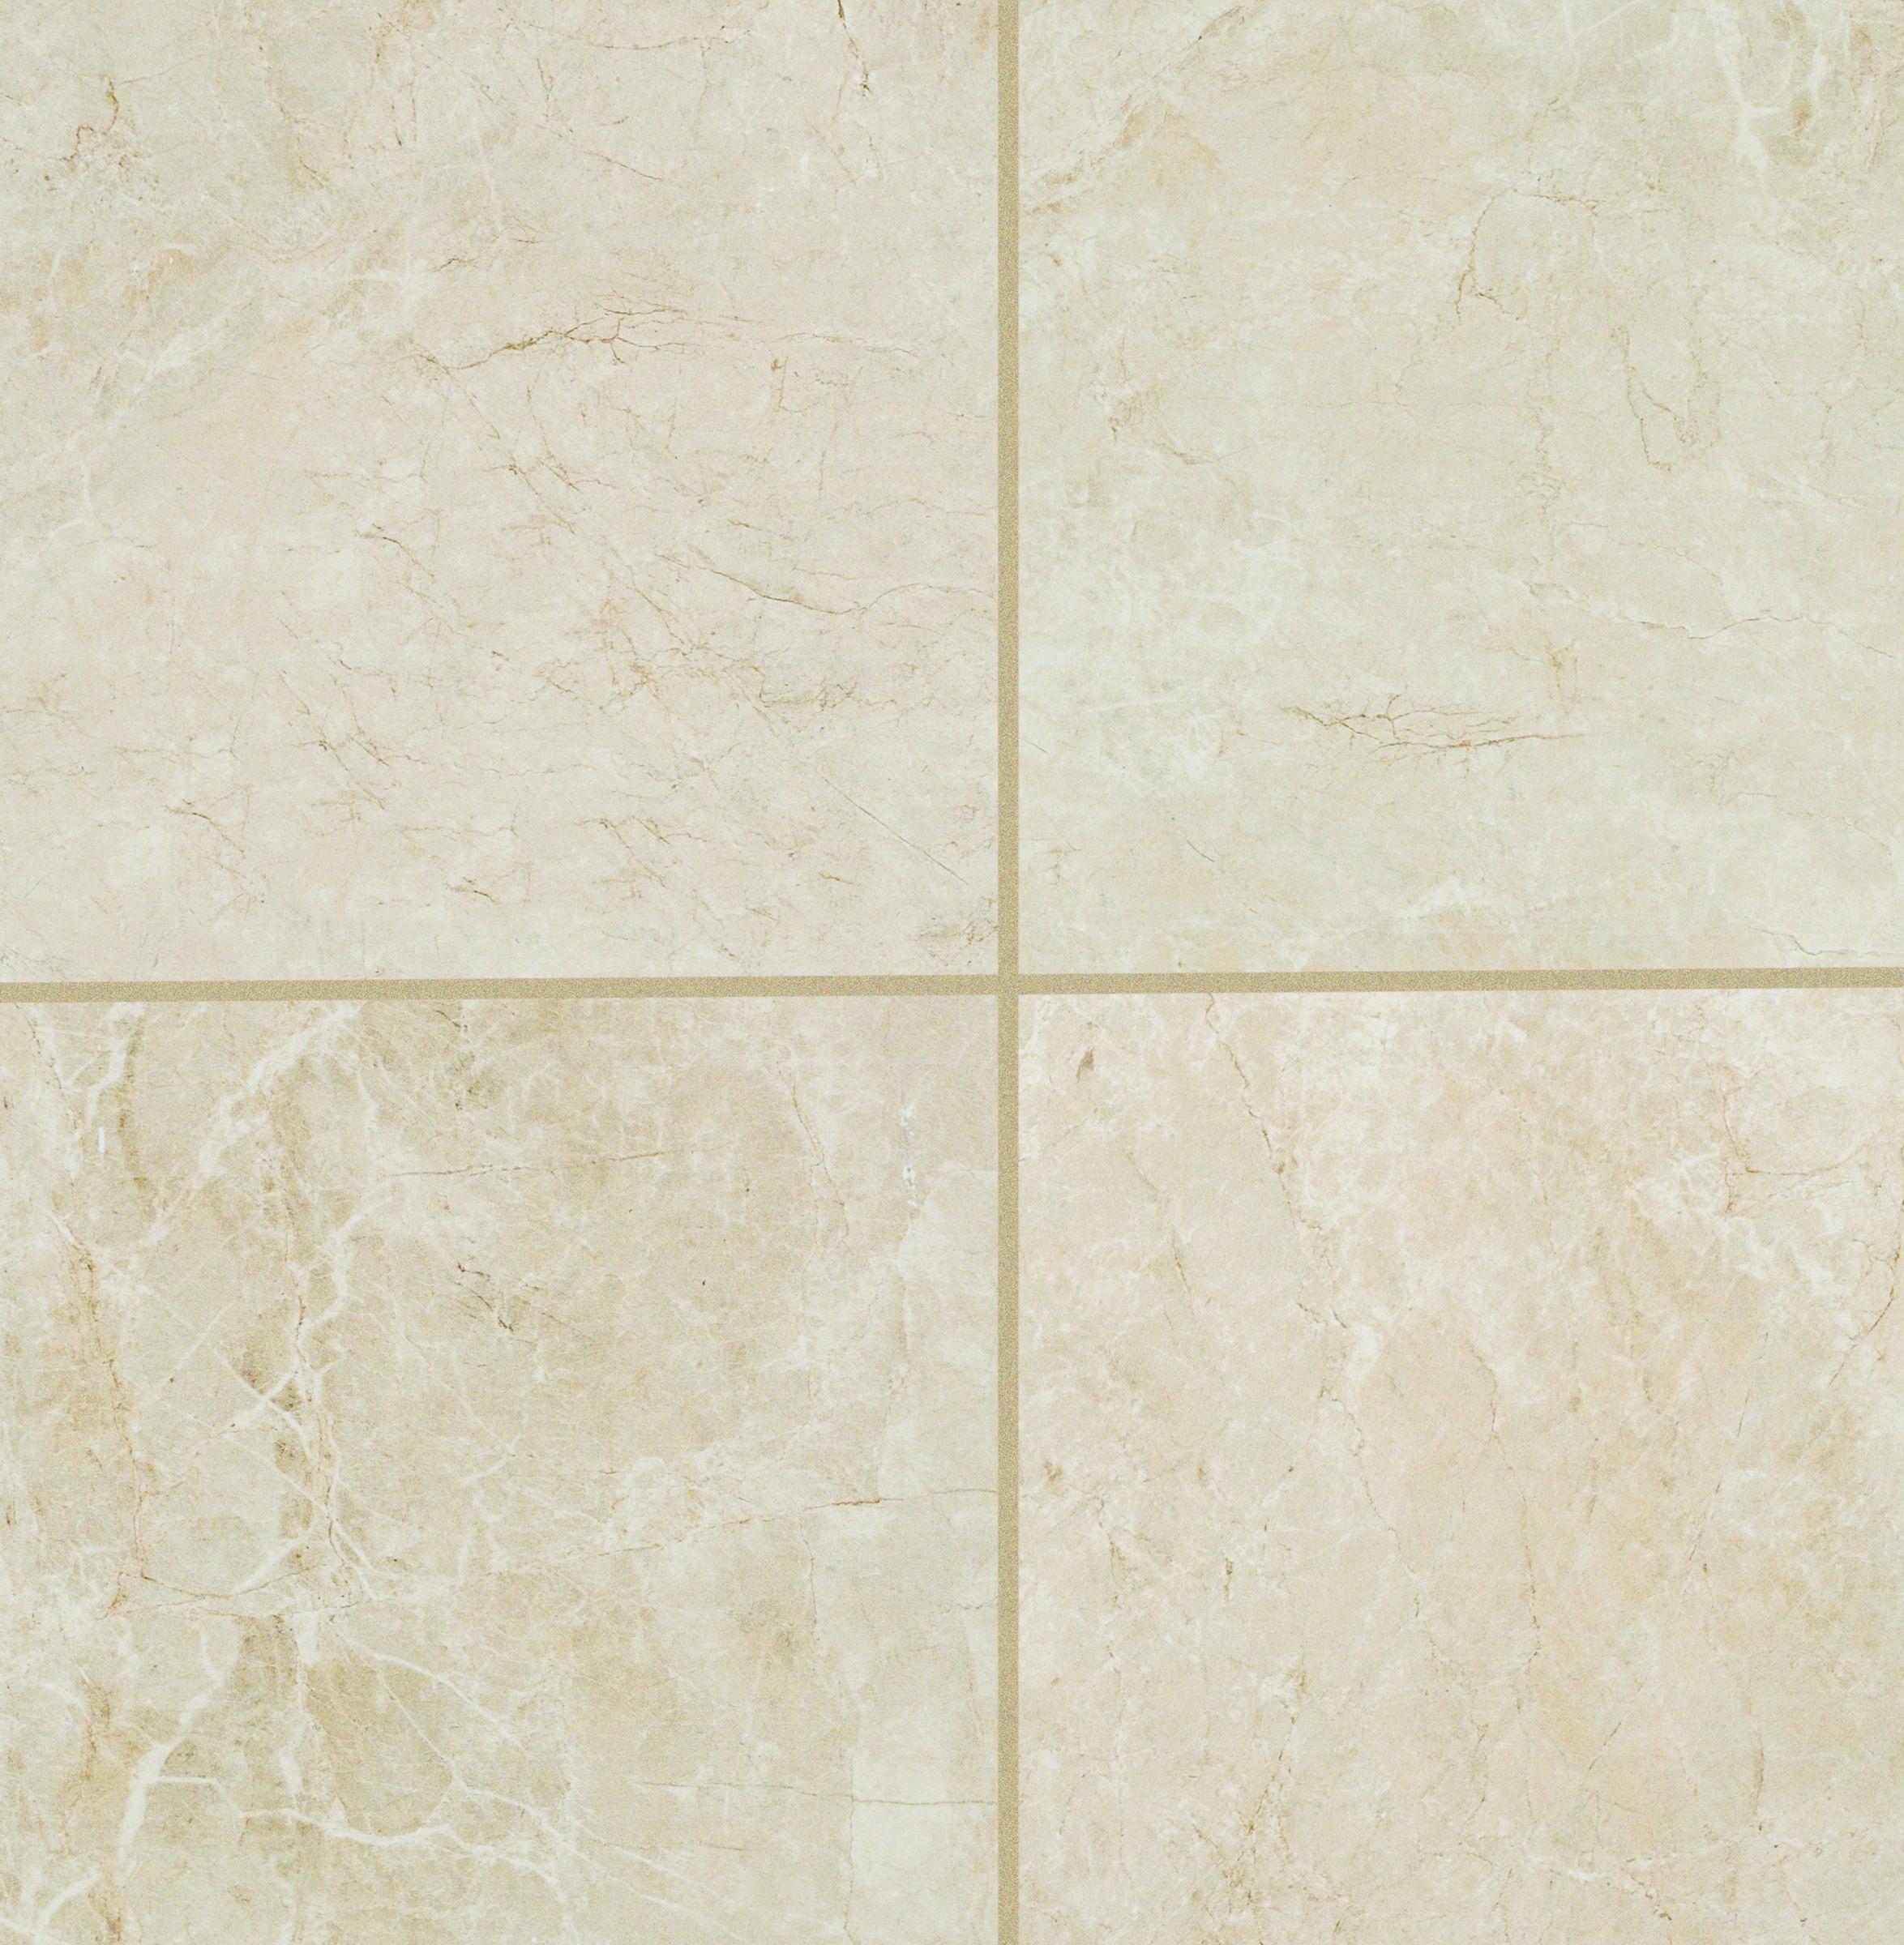 Mohawk industries 16158 crema marfil crema marfil porcelain floor mohawk industries 16158 crema marfil crema marfil porcelain floor tile 18 inch x 18 inch 1750 sf carton floormall doublecrazyfo Image collections